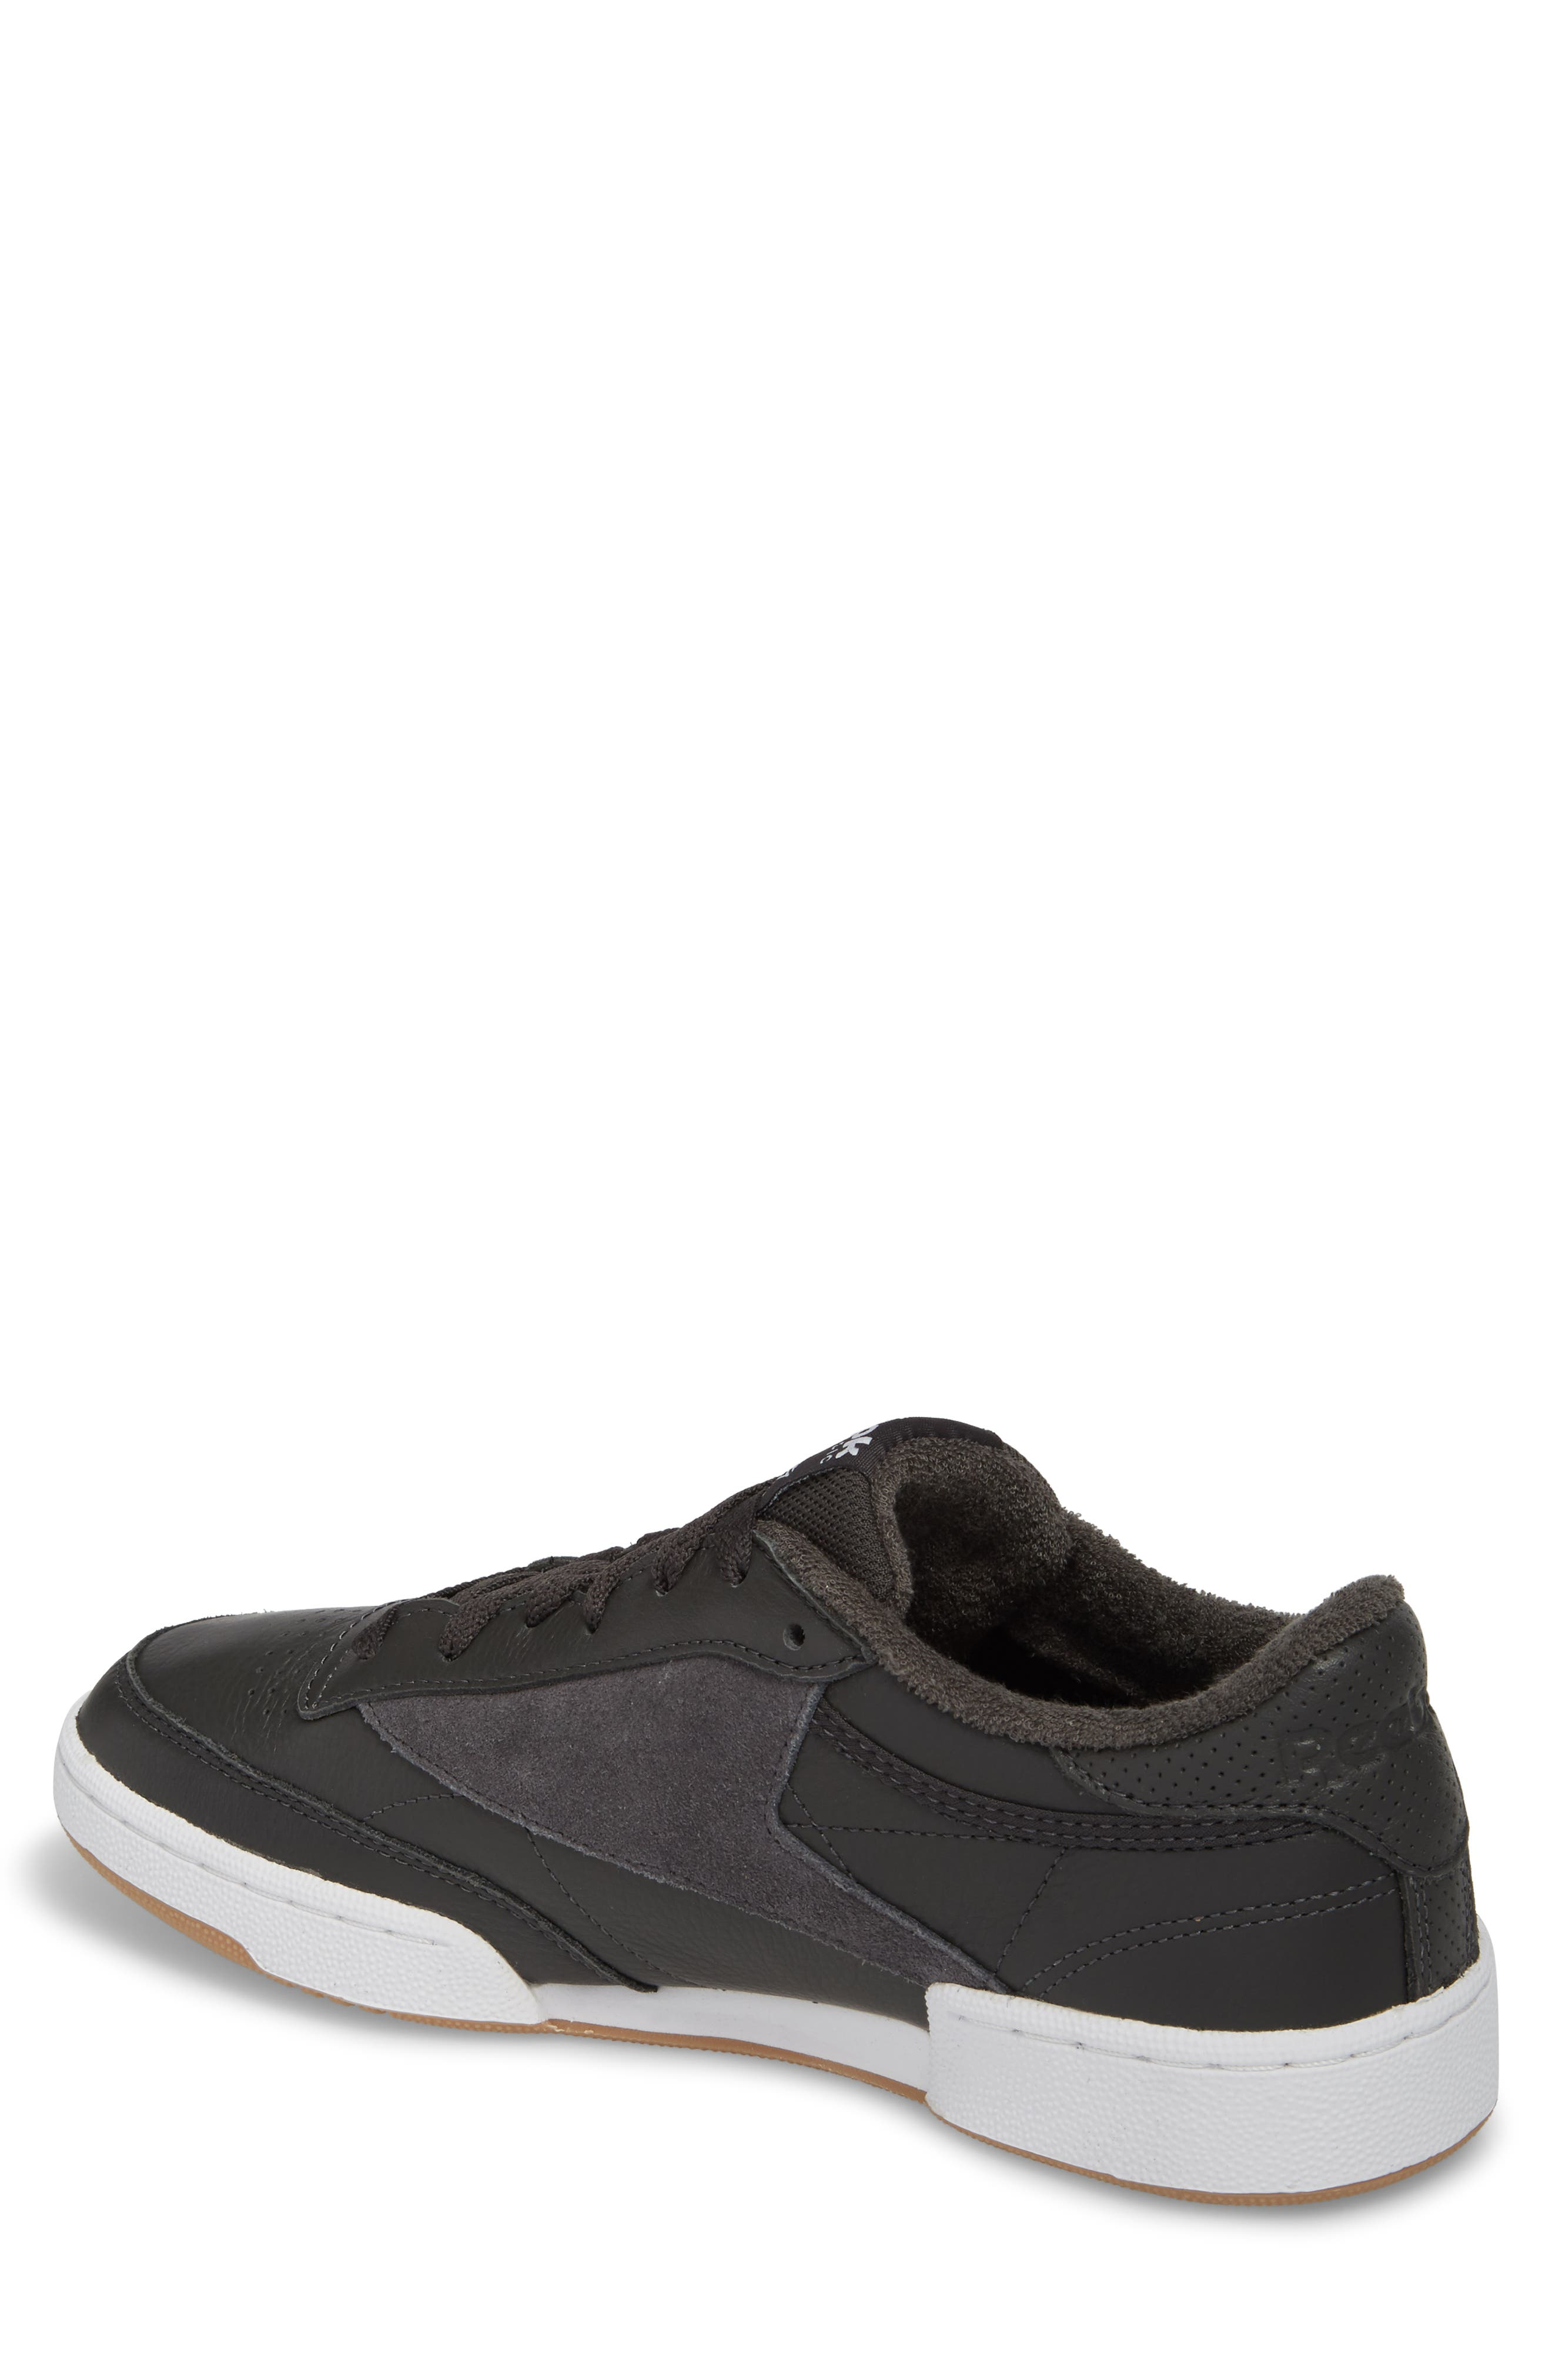 Club C 85 ESTL Sneaker,                             Alternate thumbnail 2, color,                             Coal/ White/ Washed Blue